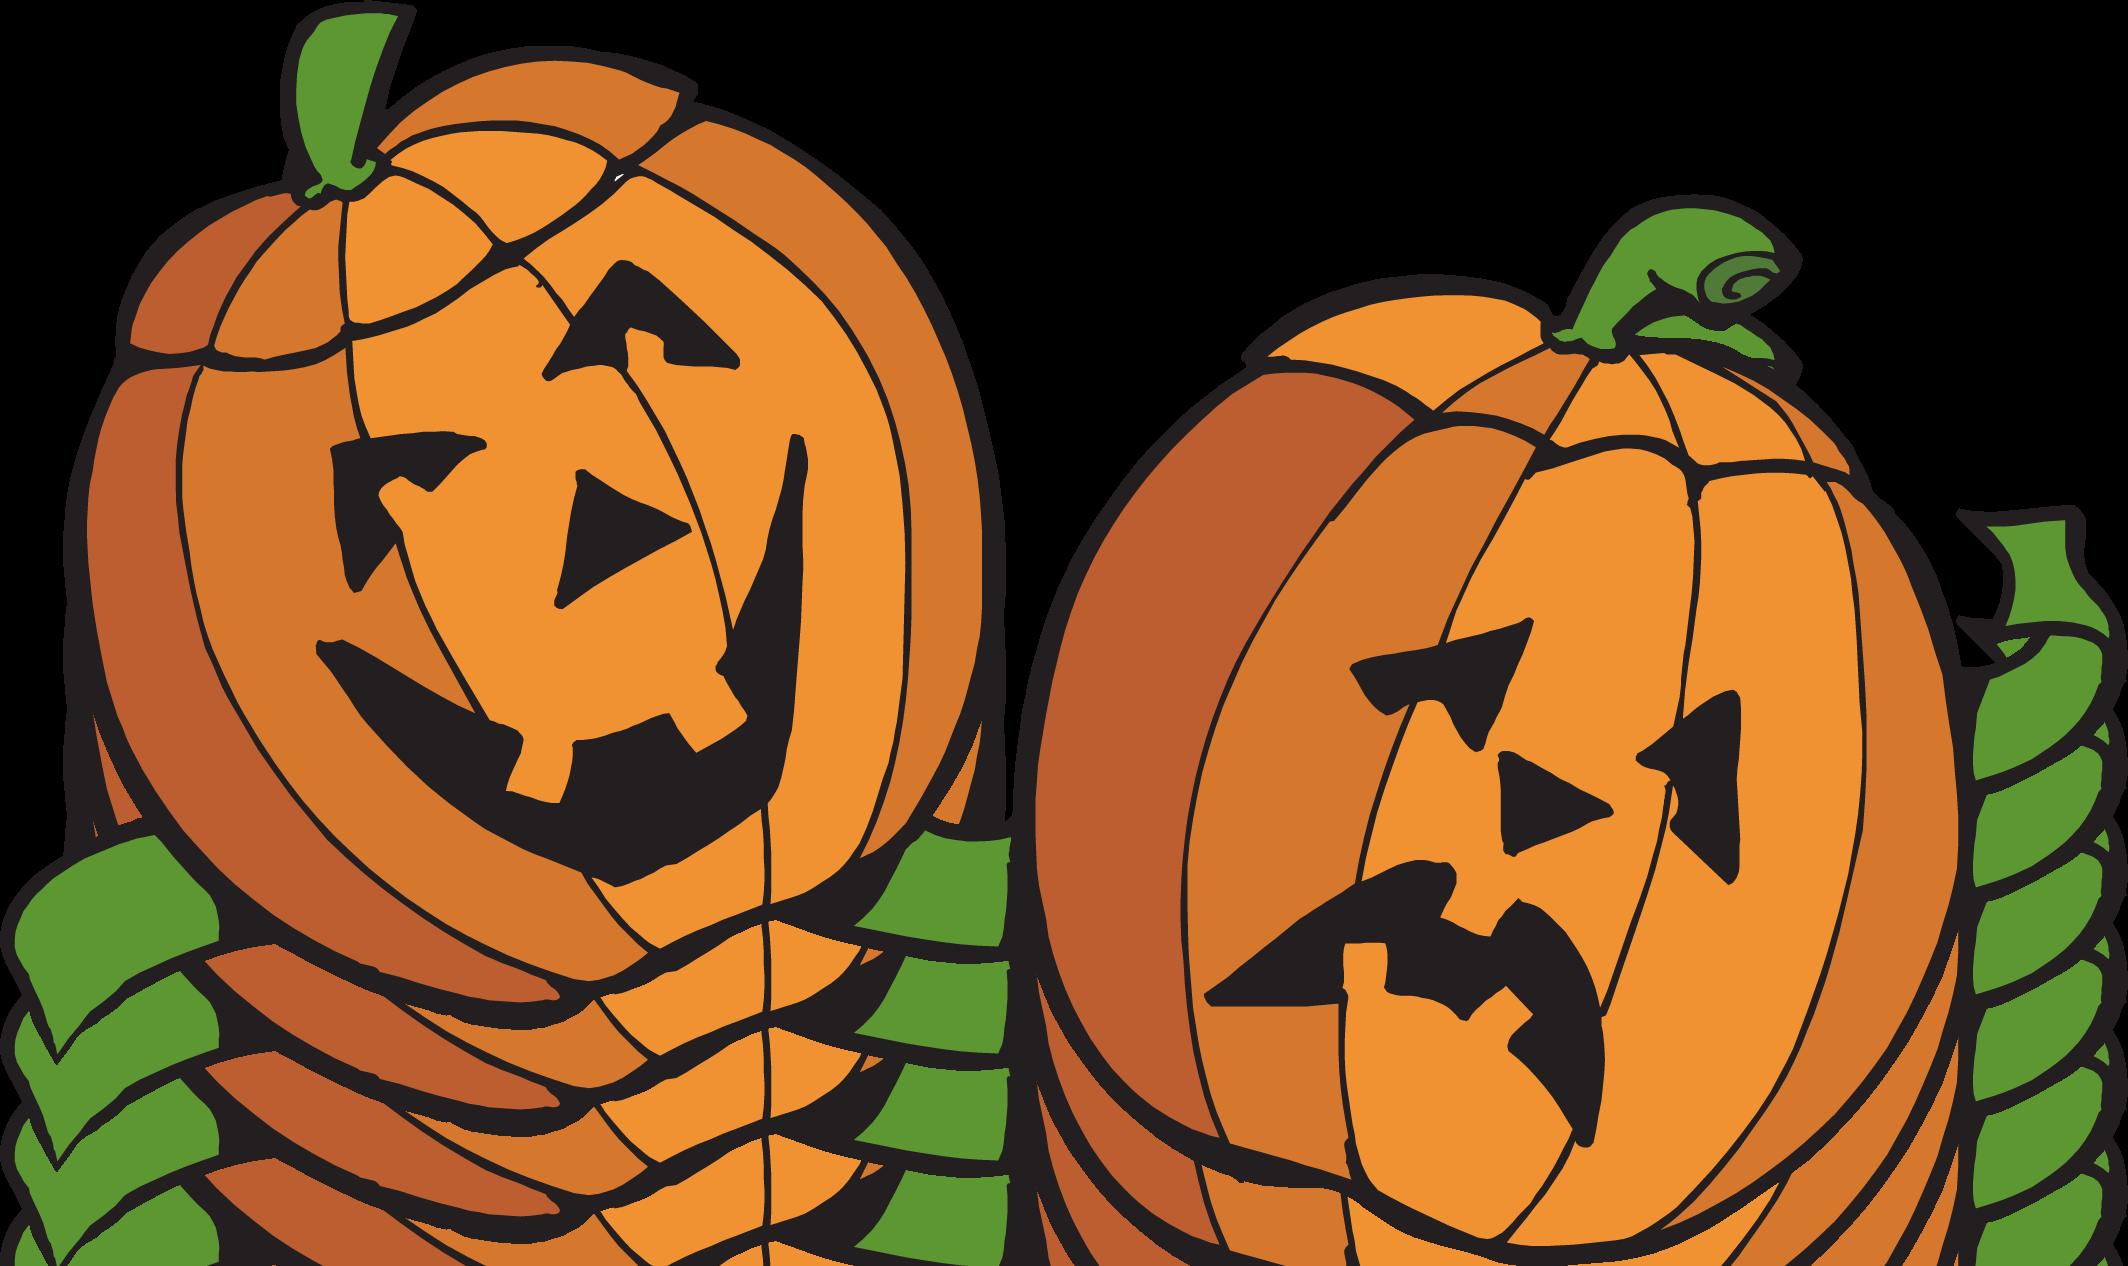 2128x1266 Pumpkin Patch Clipart For Free 101 Clip Art